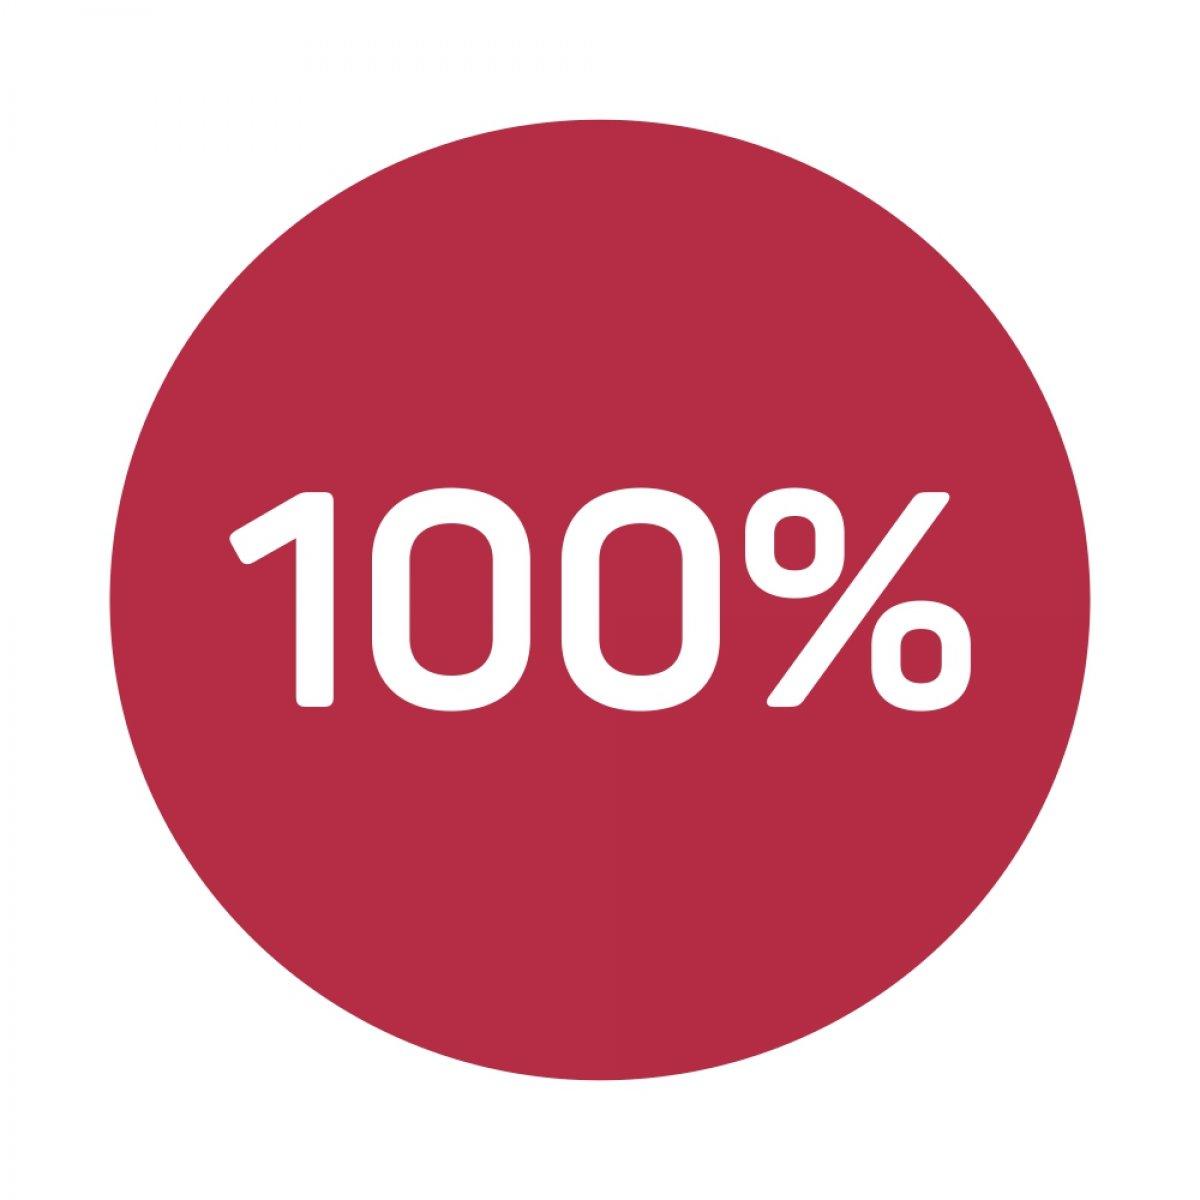 100% da Tabela FIPE Aprov